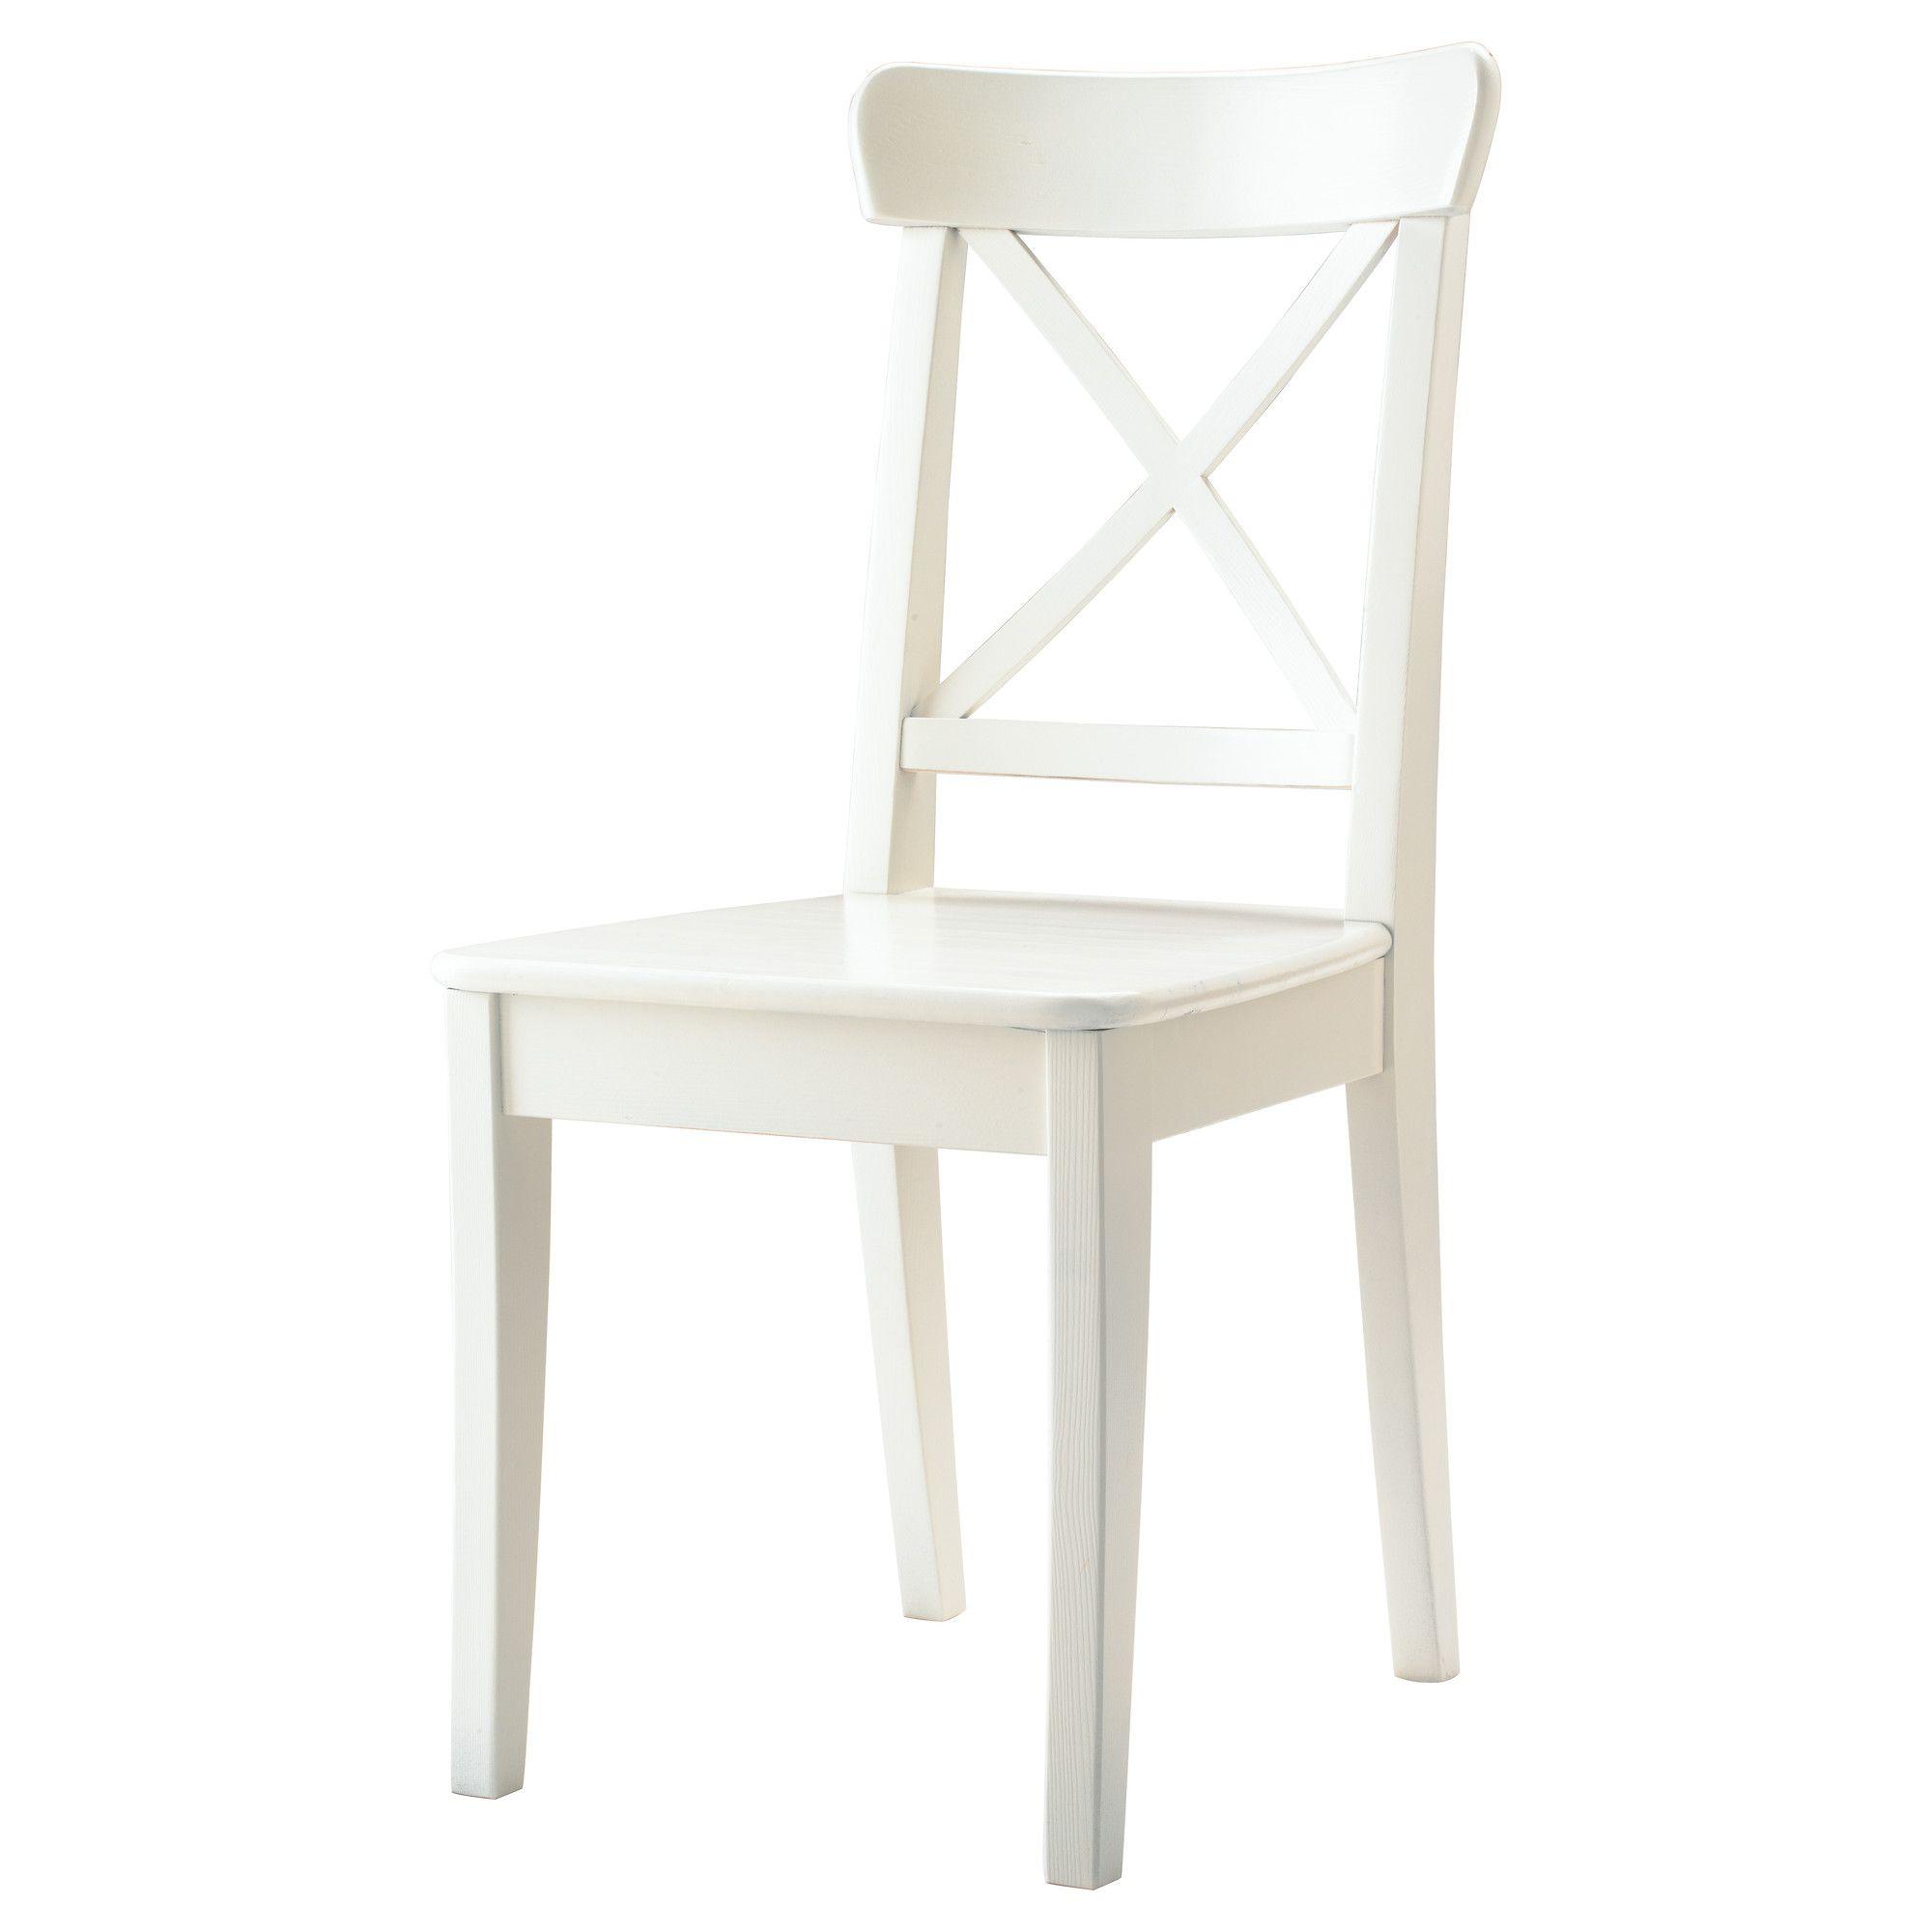 Ikea White Dining Chair: INGOLF Chair, White